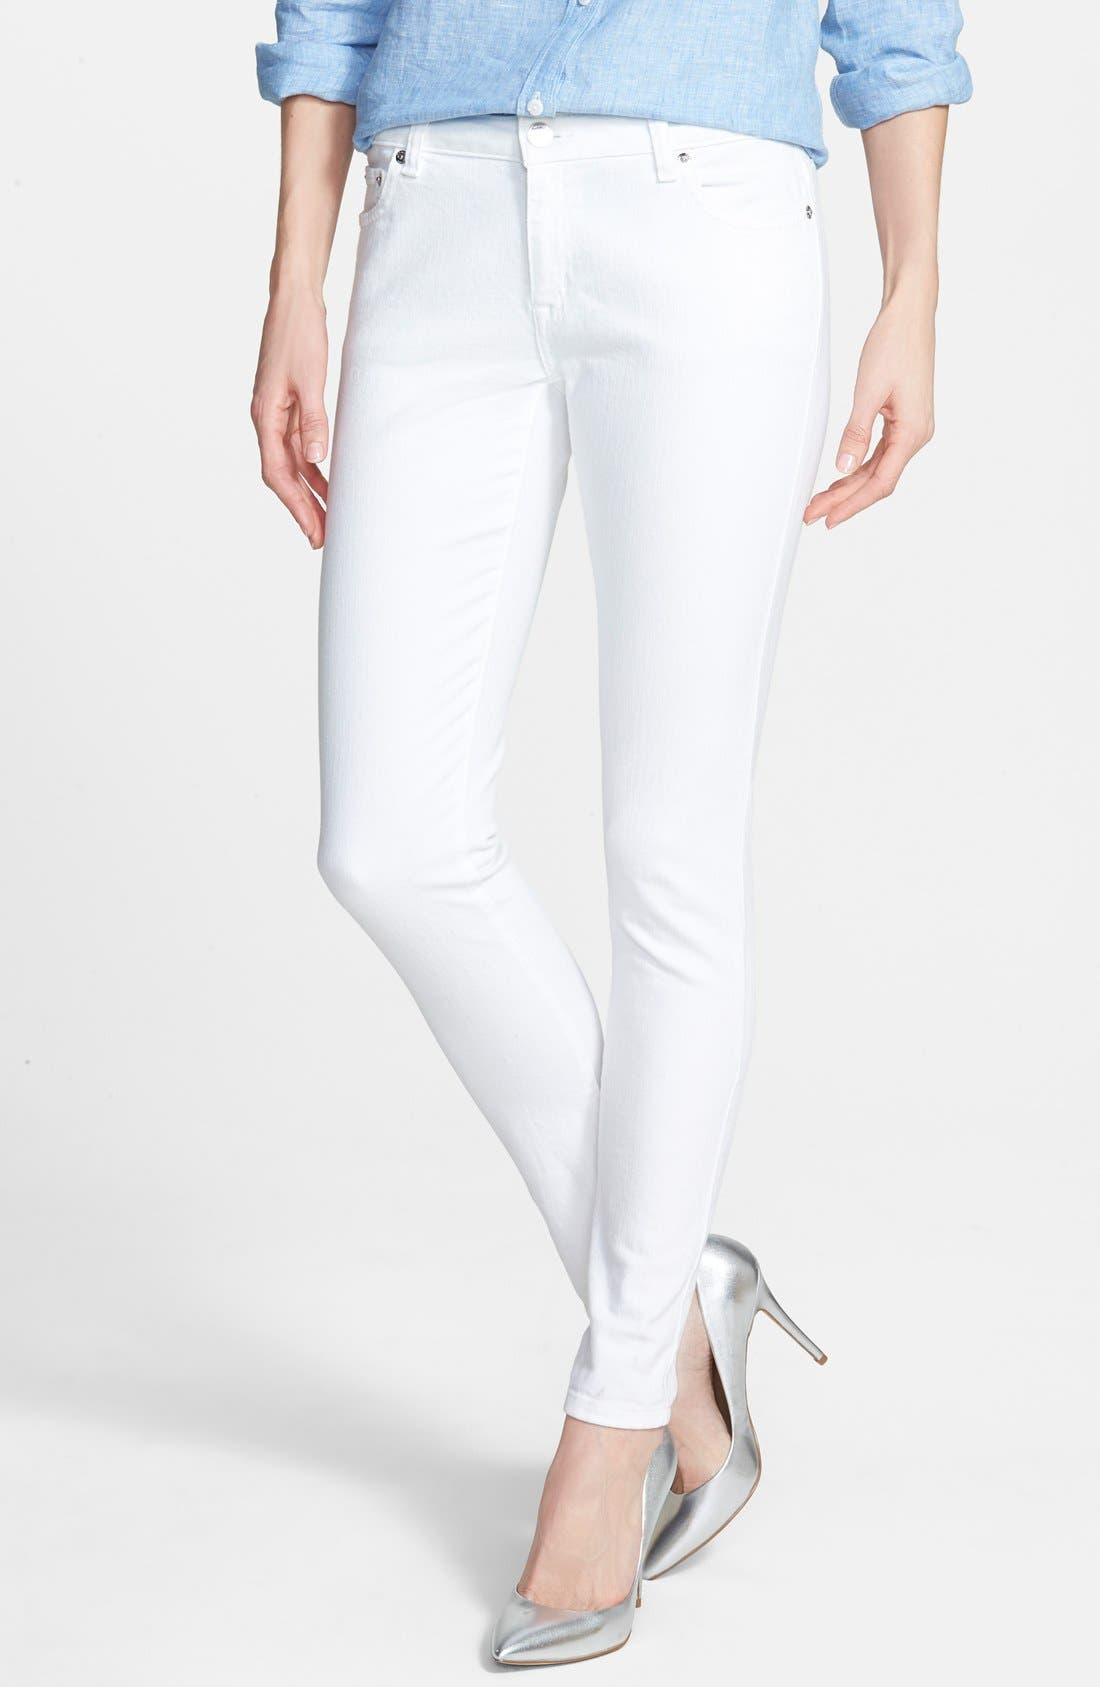 Alternate Image 1 Selected - MICHAEL Michael Kors White Skinny Jeans